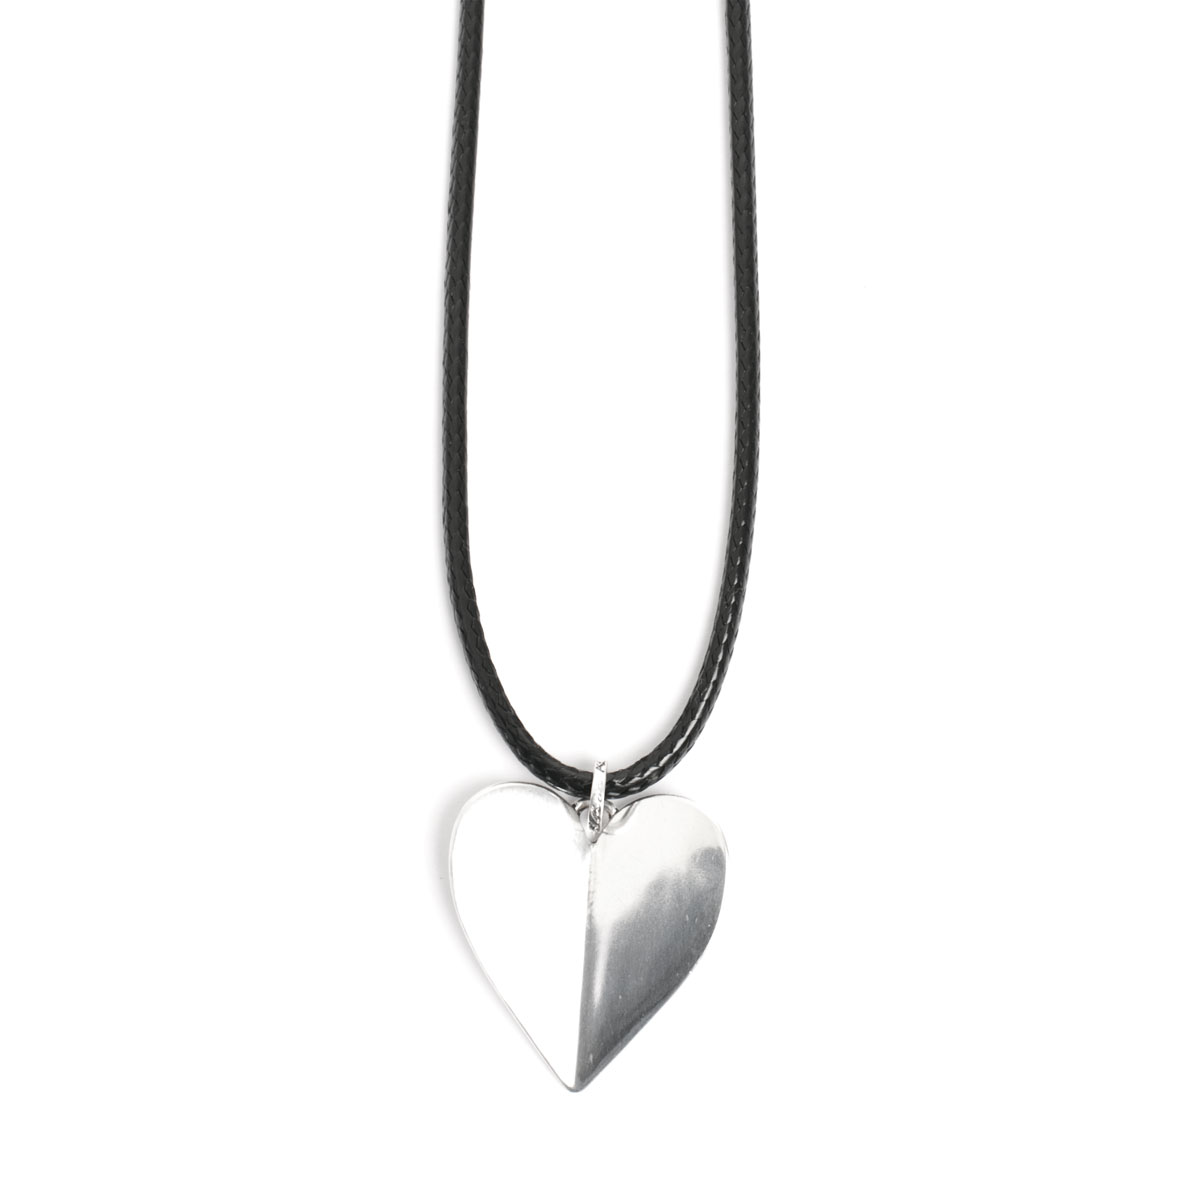 Колье(2018-0651)Angled Heart<br>Длина колье 90 см<br>